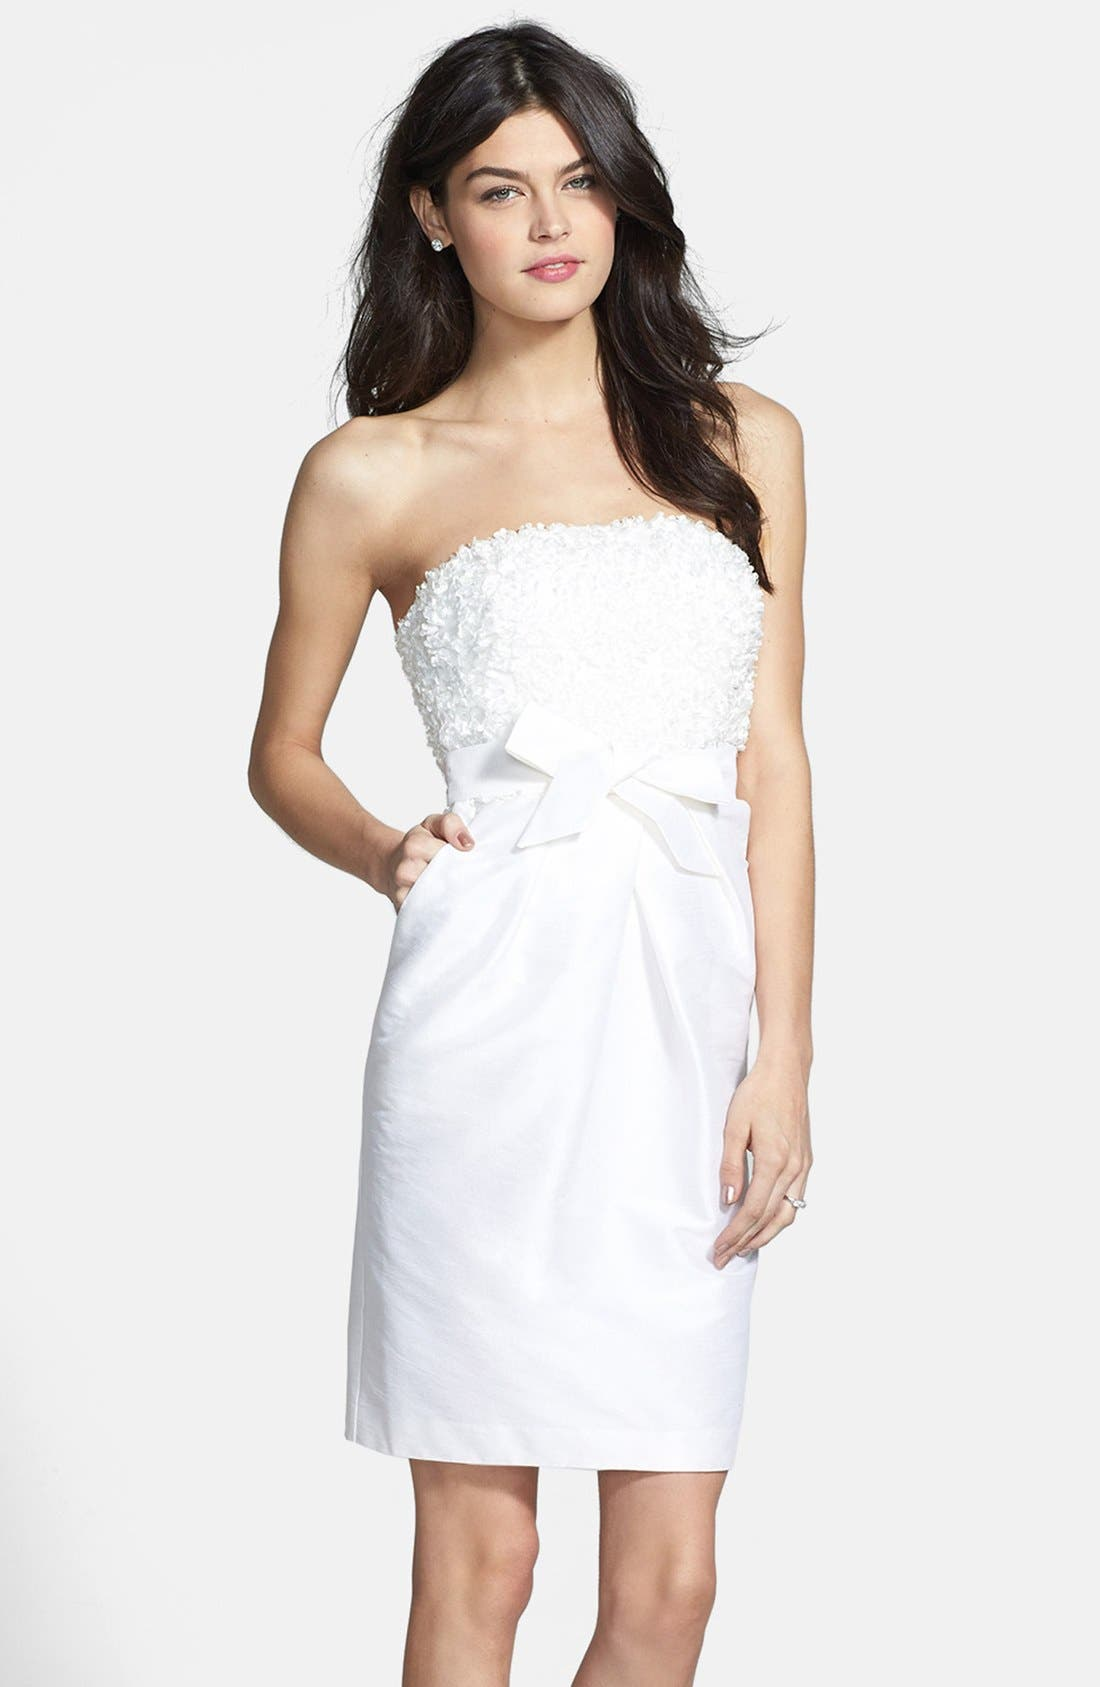 Alternate Image 1 Selected - Donna Morgan 'Gemma' Strapless Rosette Dress (Online Only)